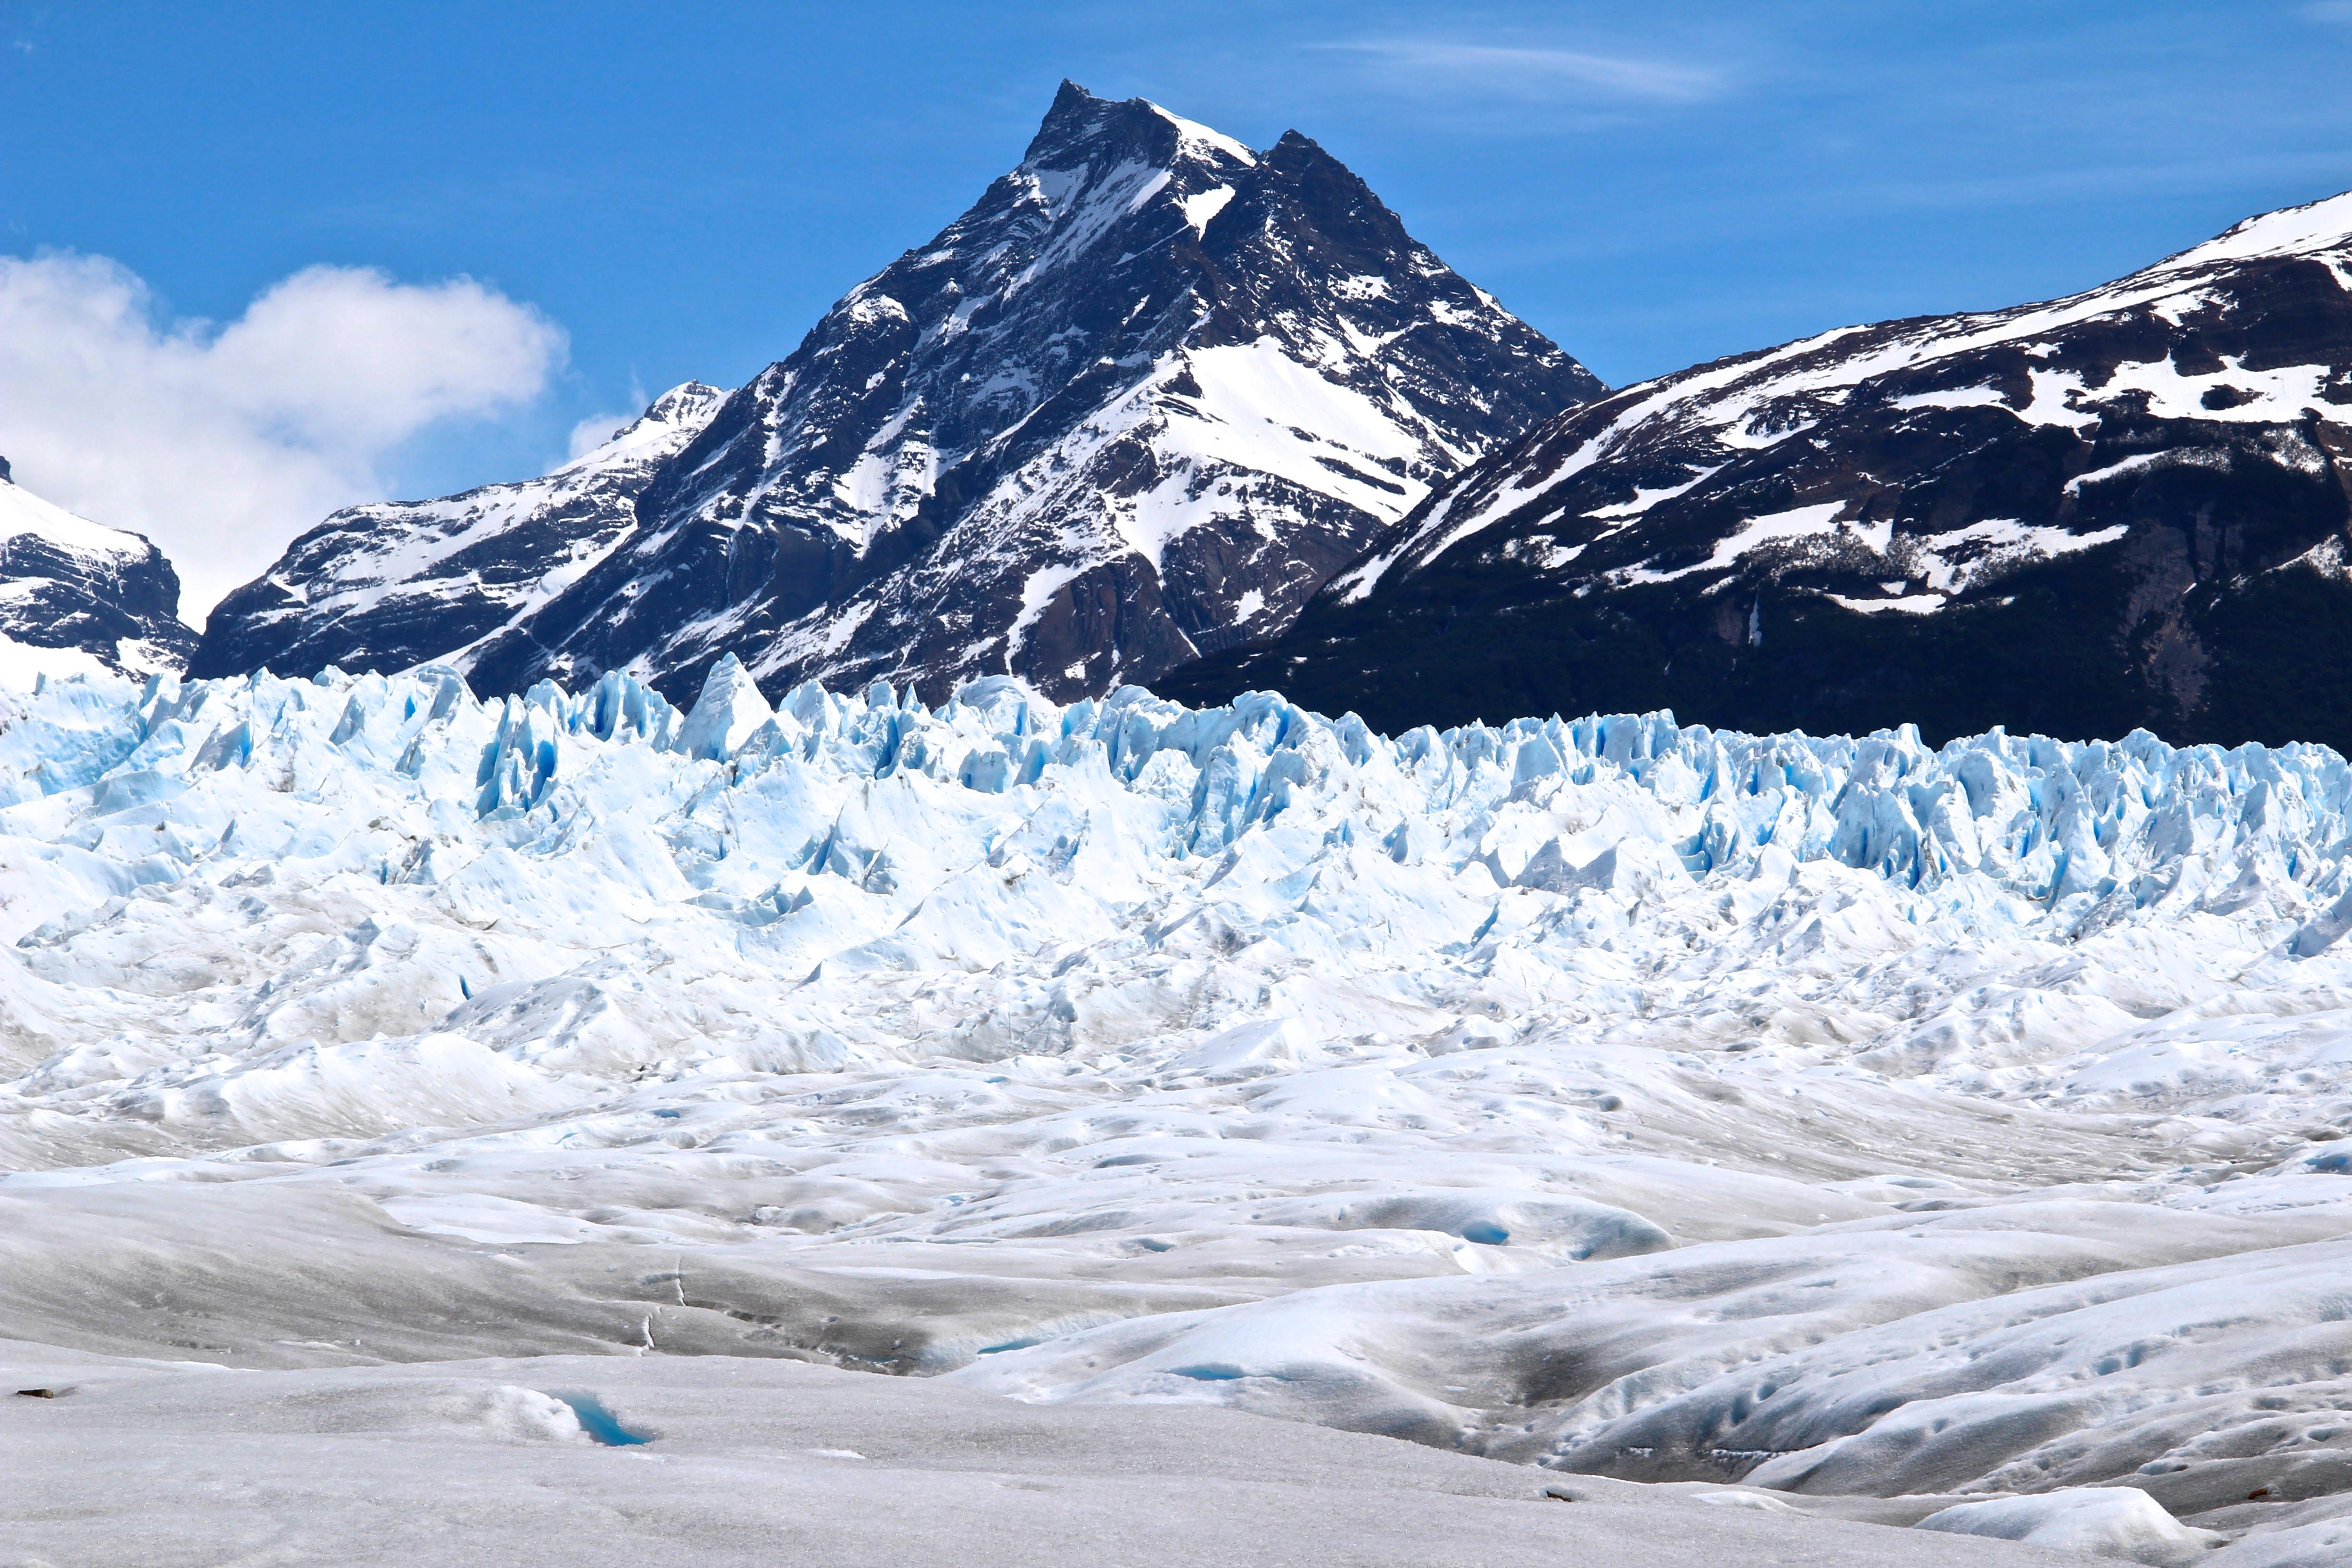 El Calafate Glacier Tour What To Wear